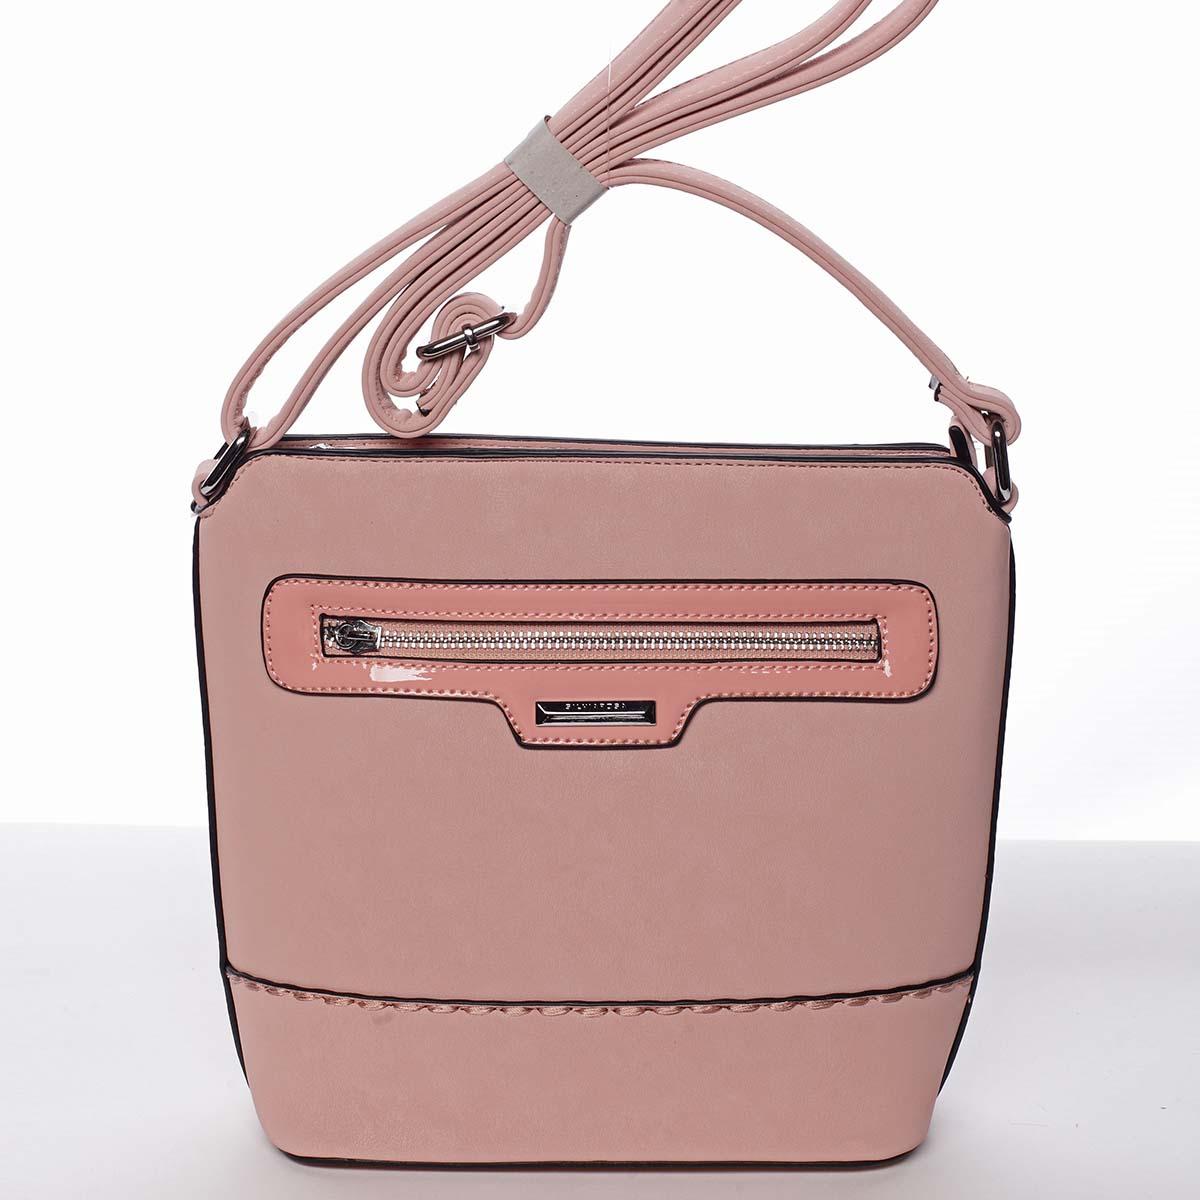 Elegantná dámska ružová crossbody kabelka - Silvia Rosa Meylin